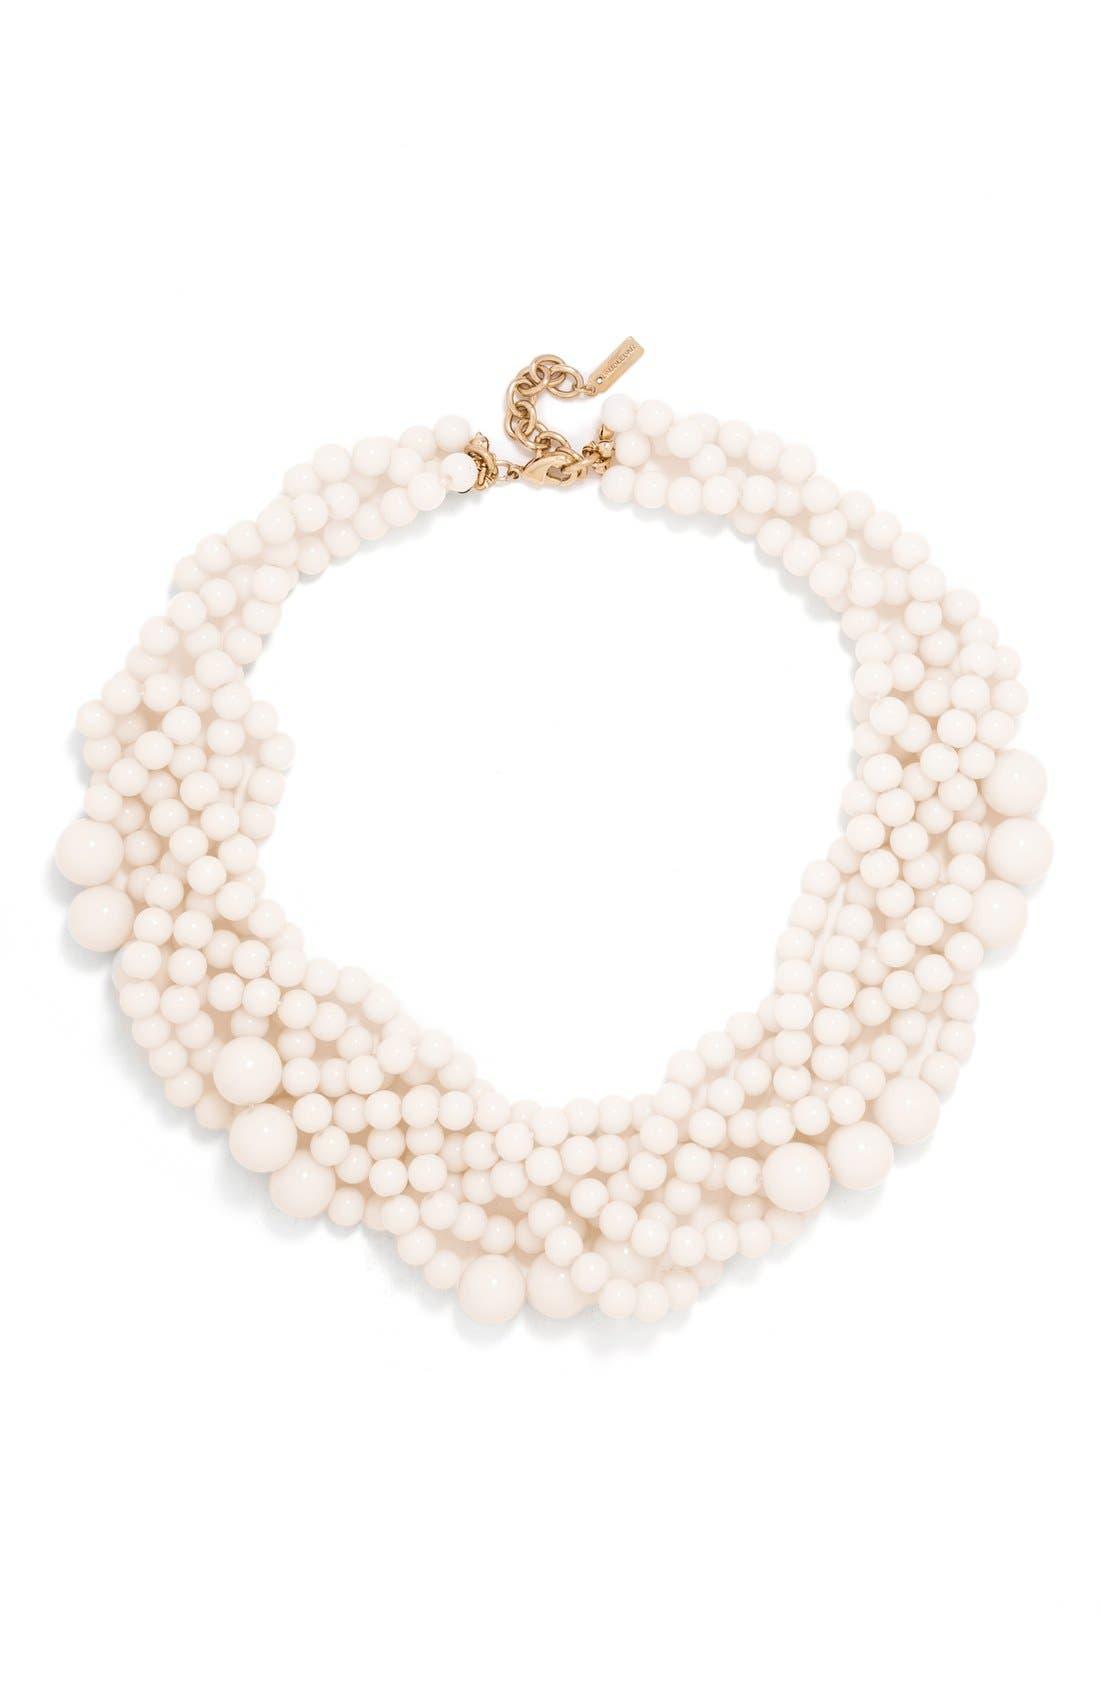 Main Image - BaubleBar Bubblestream Imitation Pearl Necklace